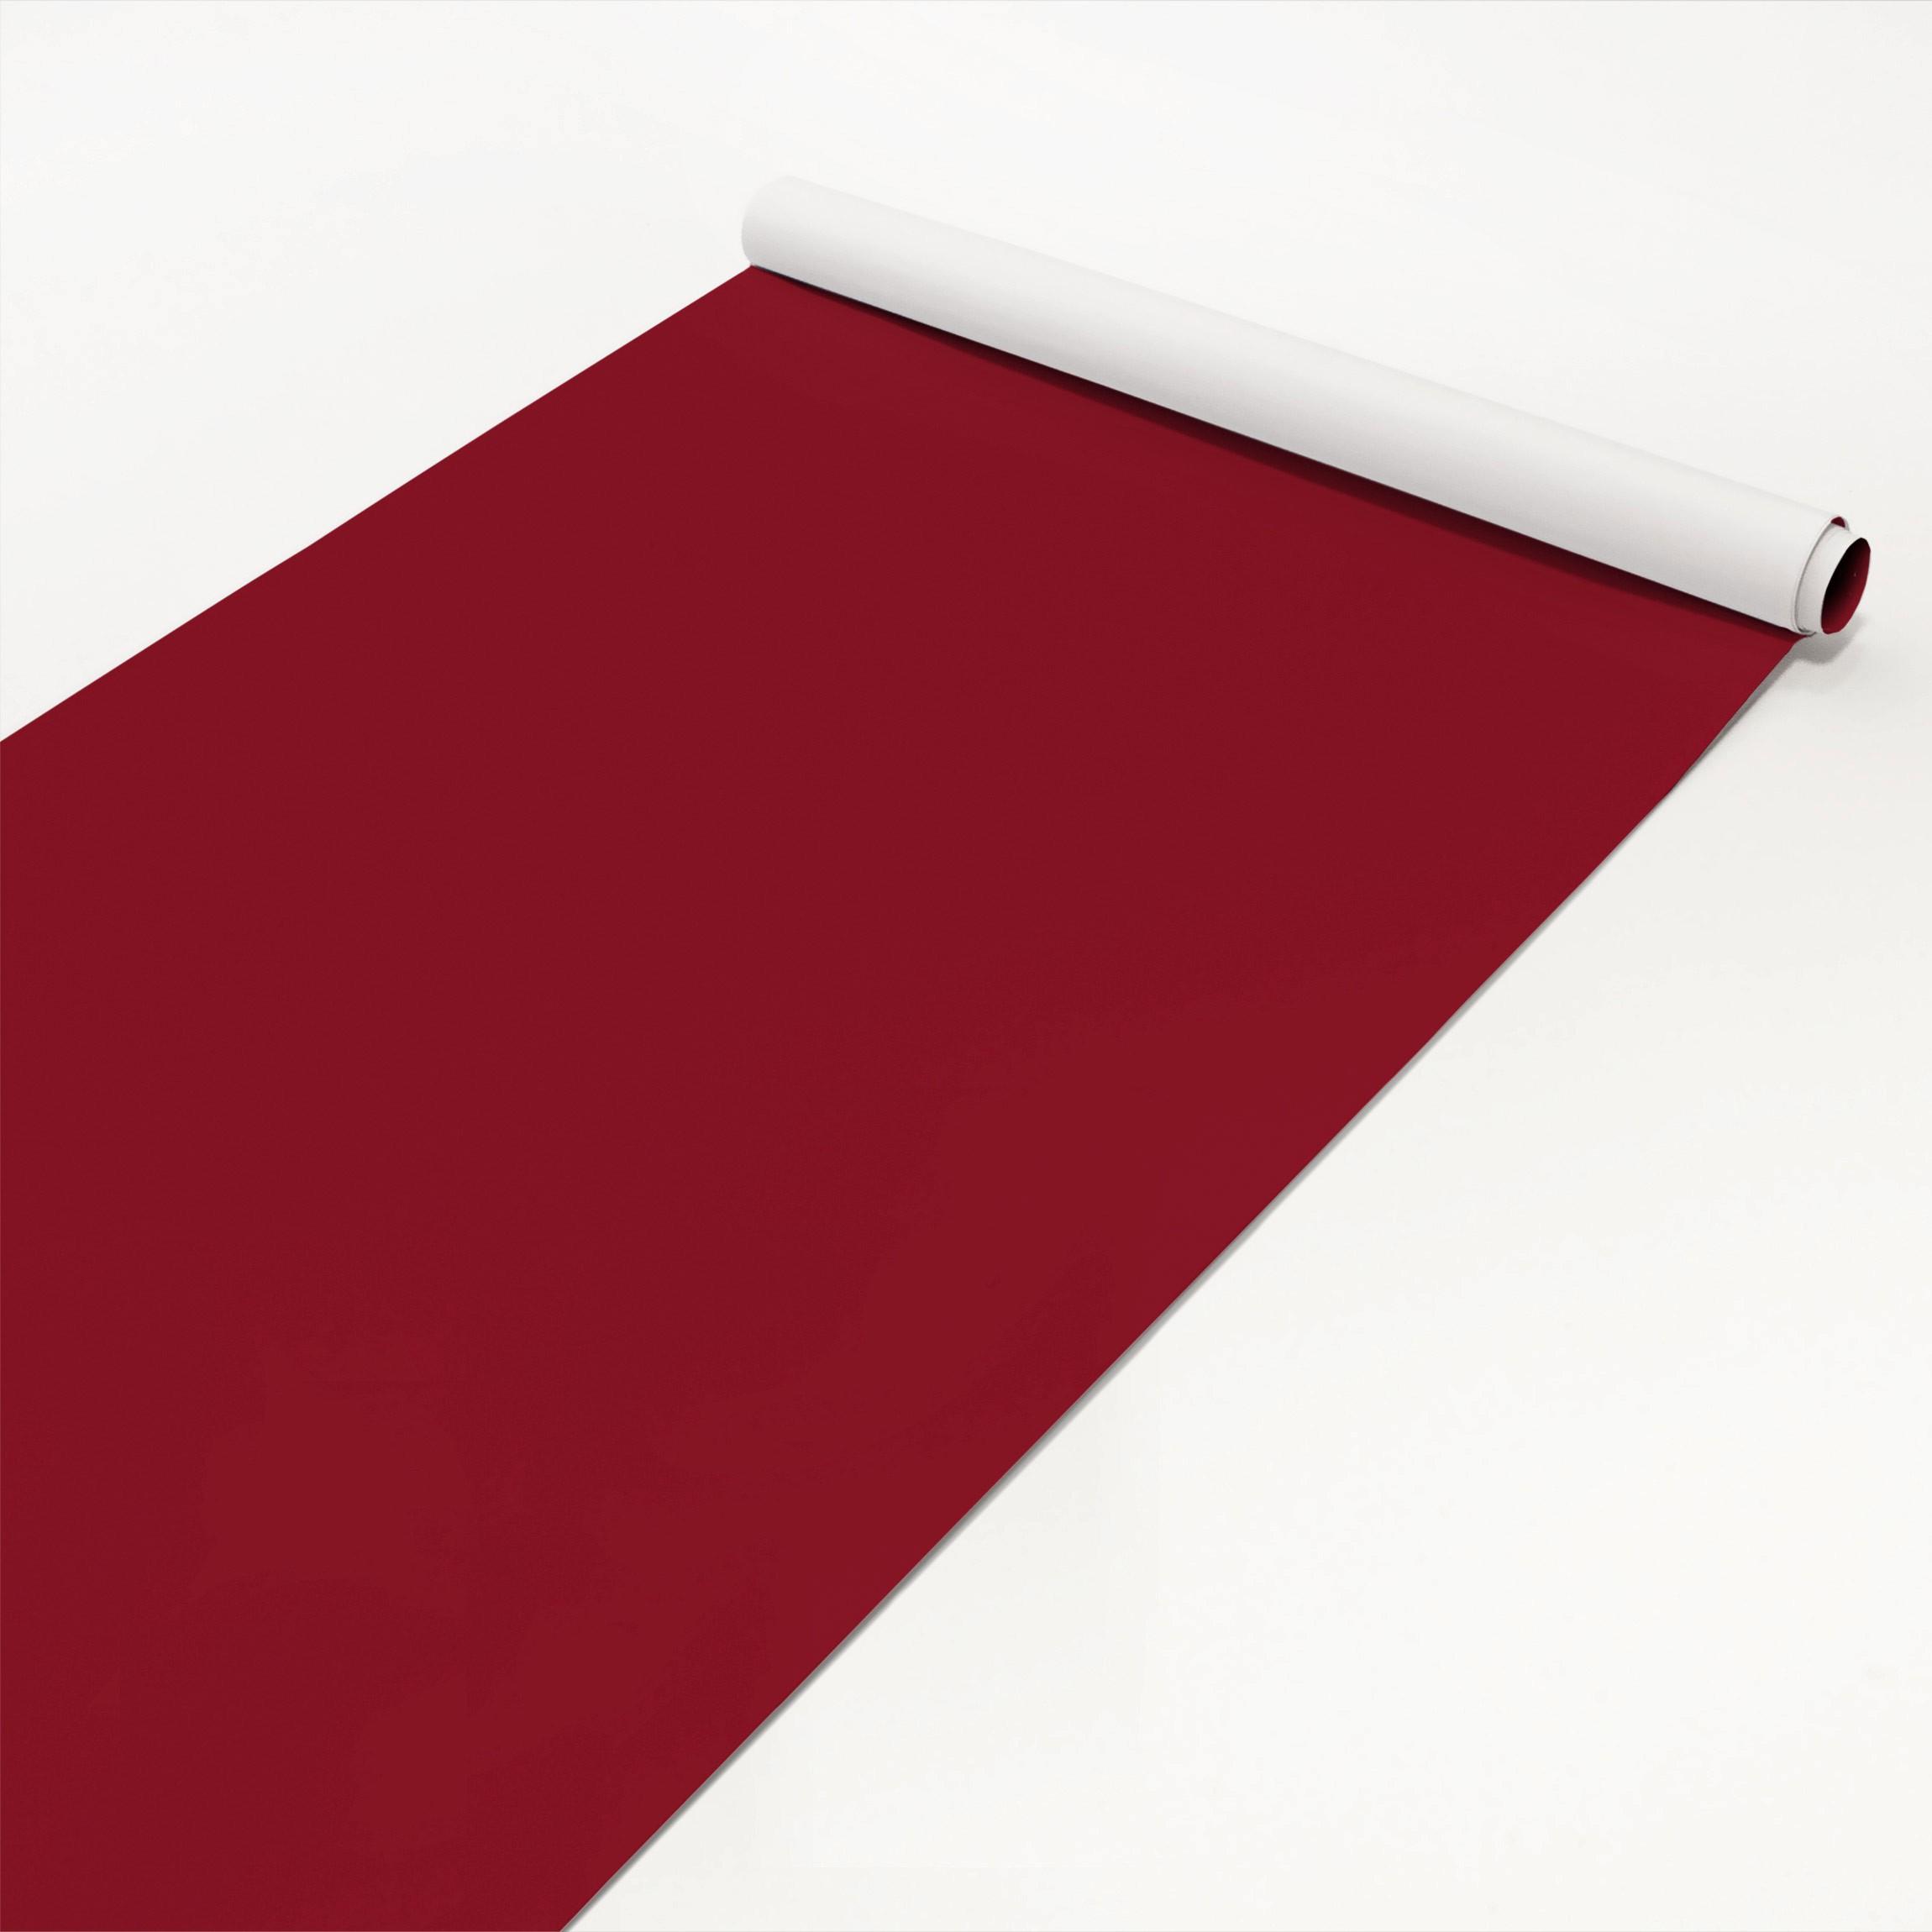 Klebefolie Rot Einfarbig Amarena Rote Folie Selbstklebend